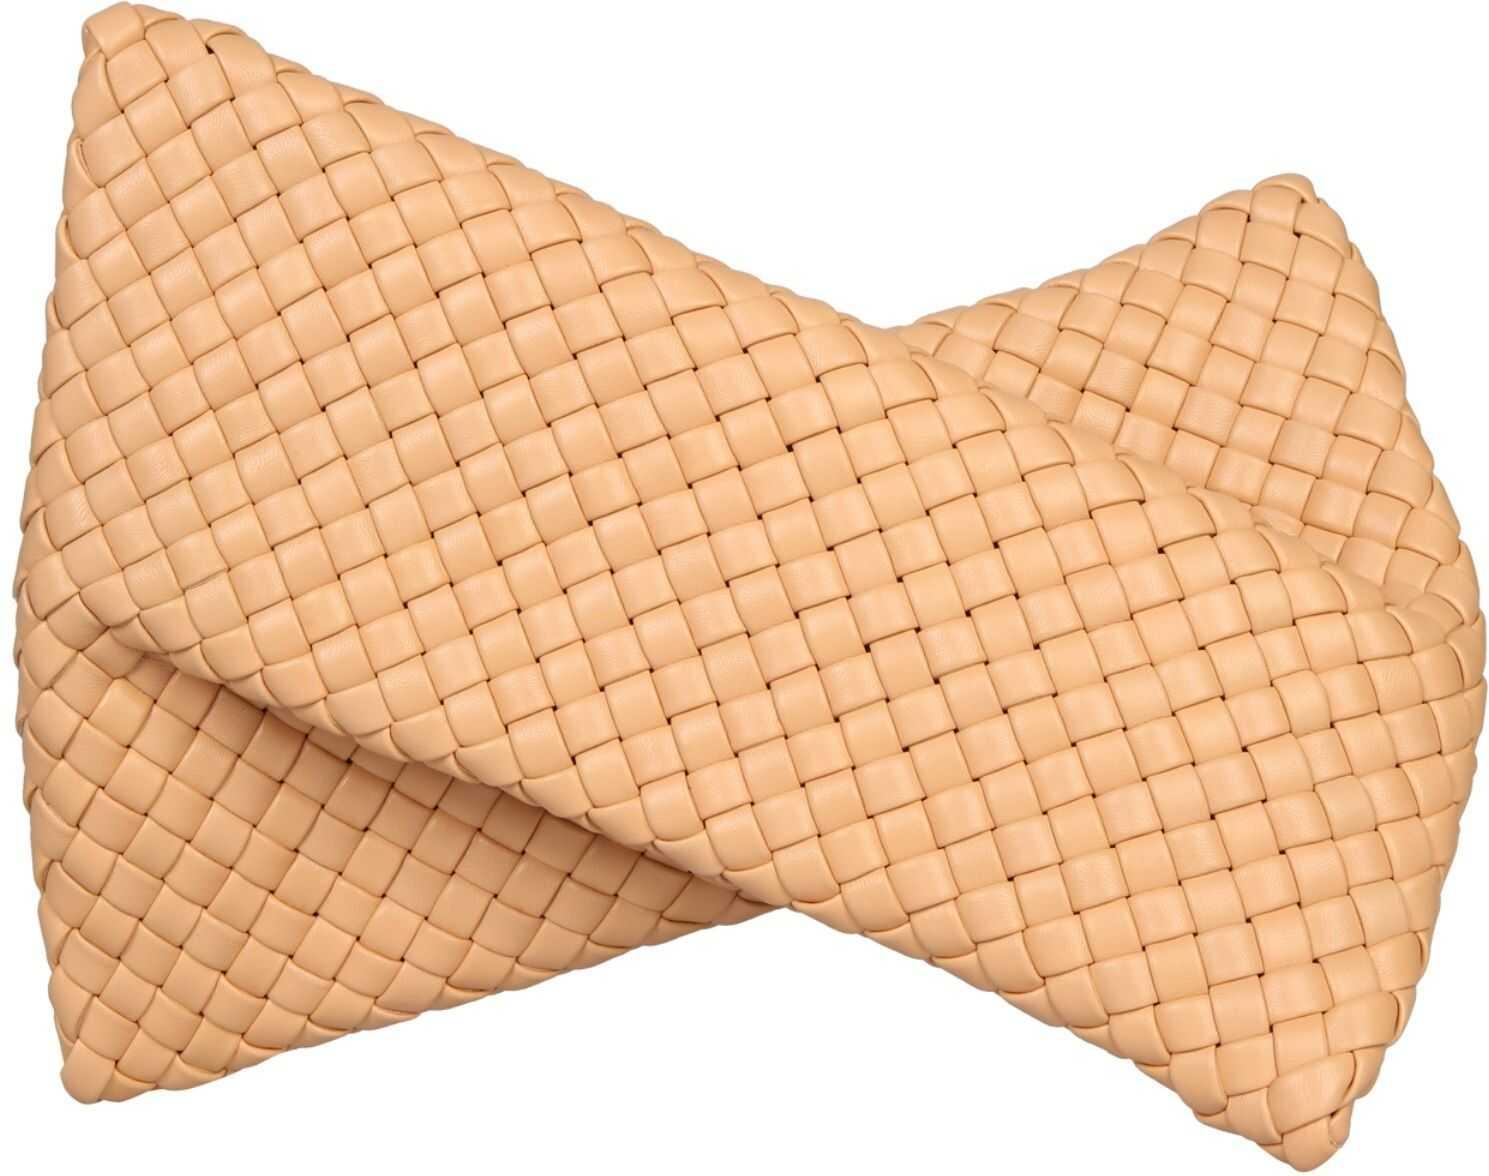 "Bottega Veneta ""The Crisscross"" Clutch 640678_V01D12700 BEIGE imagine b-mall.ro"